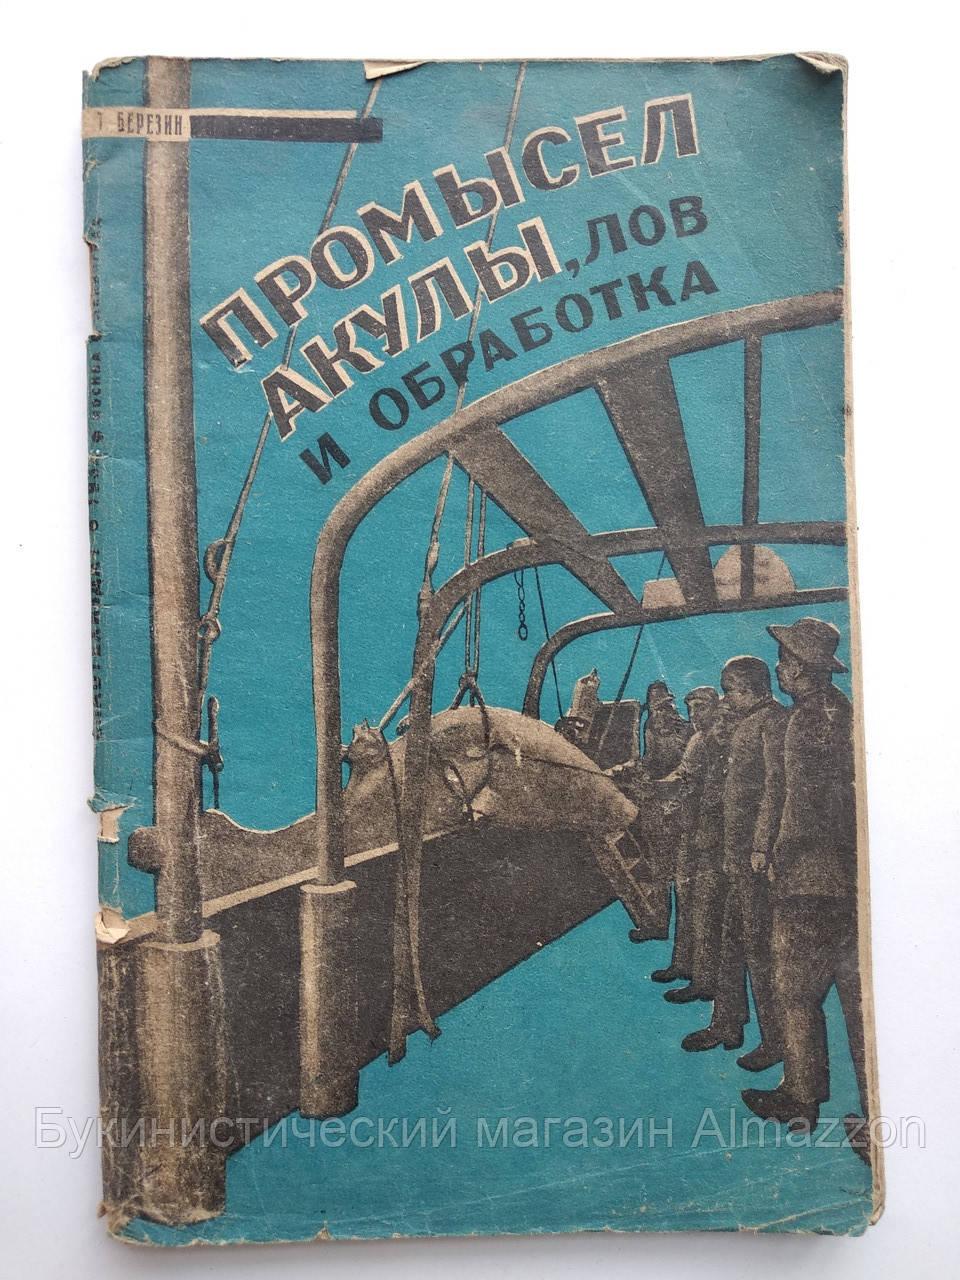 1932 Промысел акулы лов и обработка Н.Березин Снабтехиздат